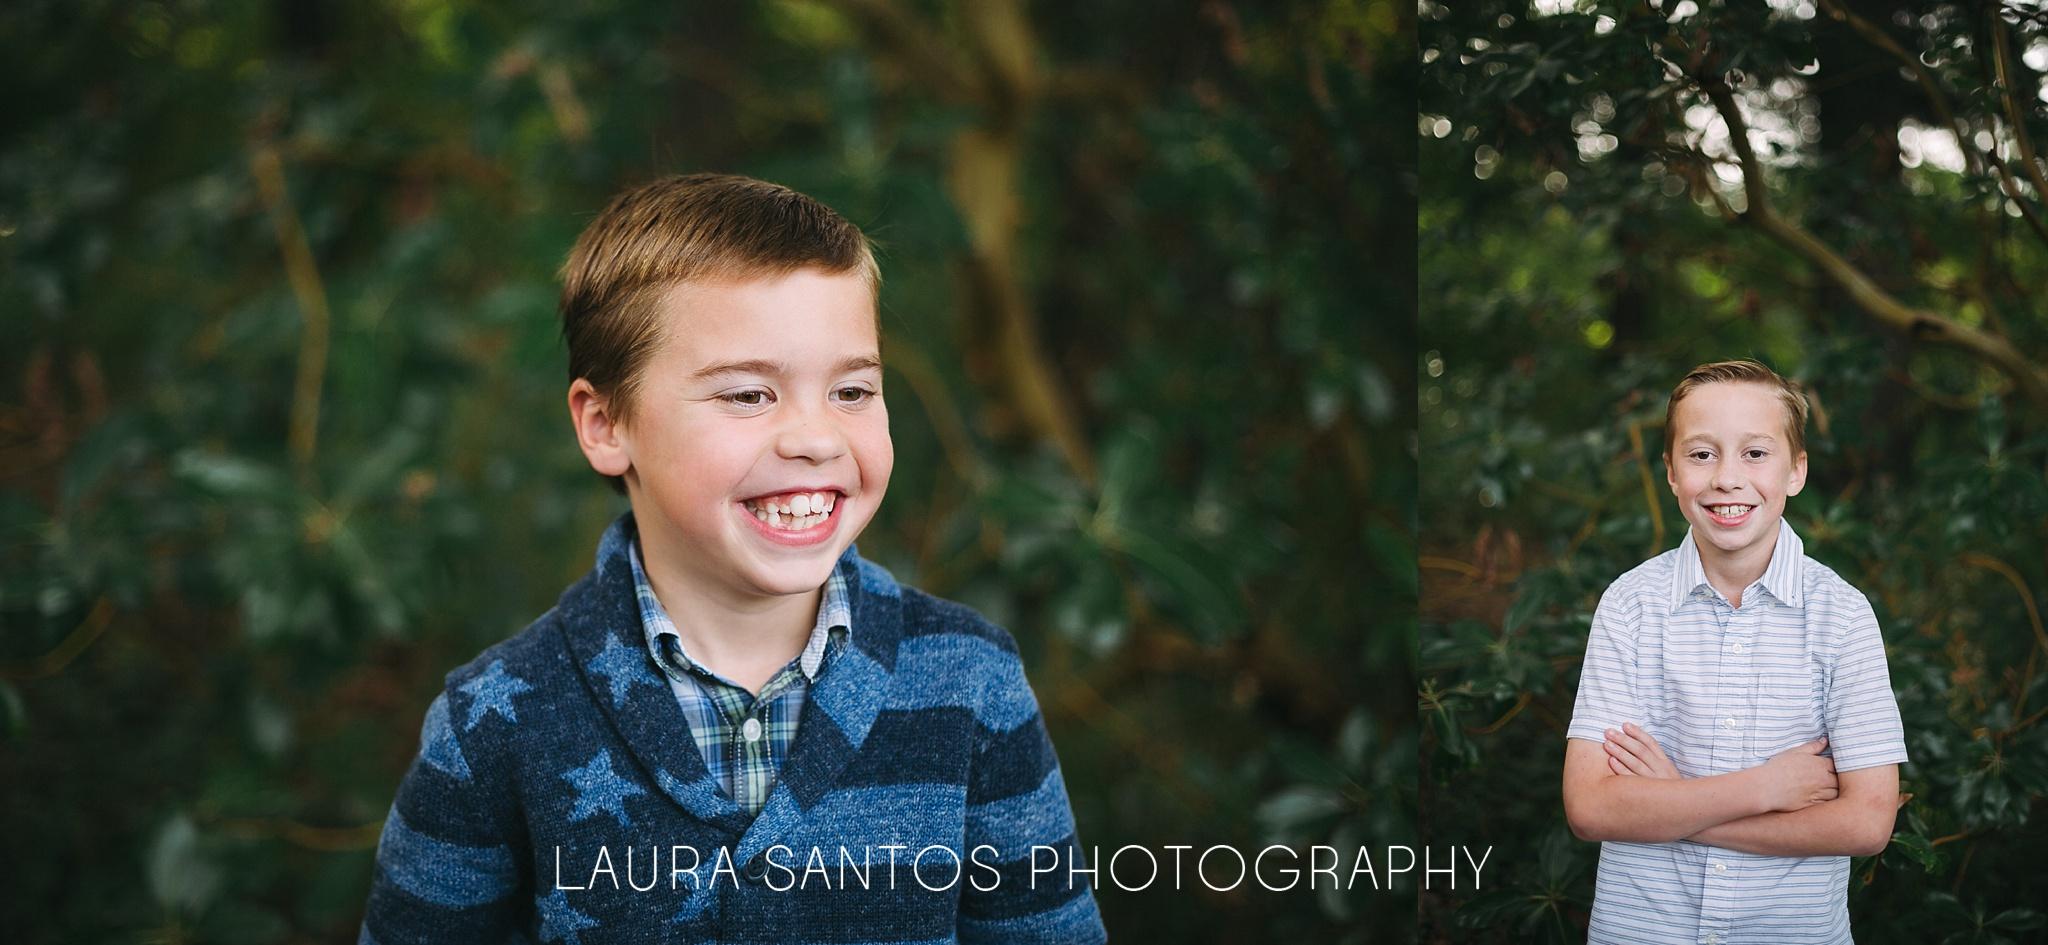 Laura Santos Photography Portland Oregon Family Photographer_0384.jpg